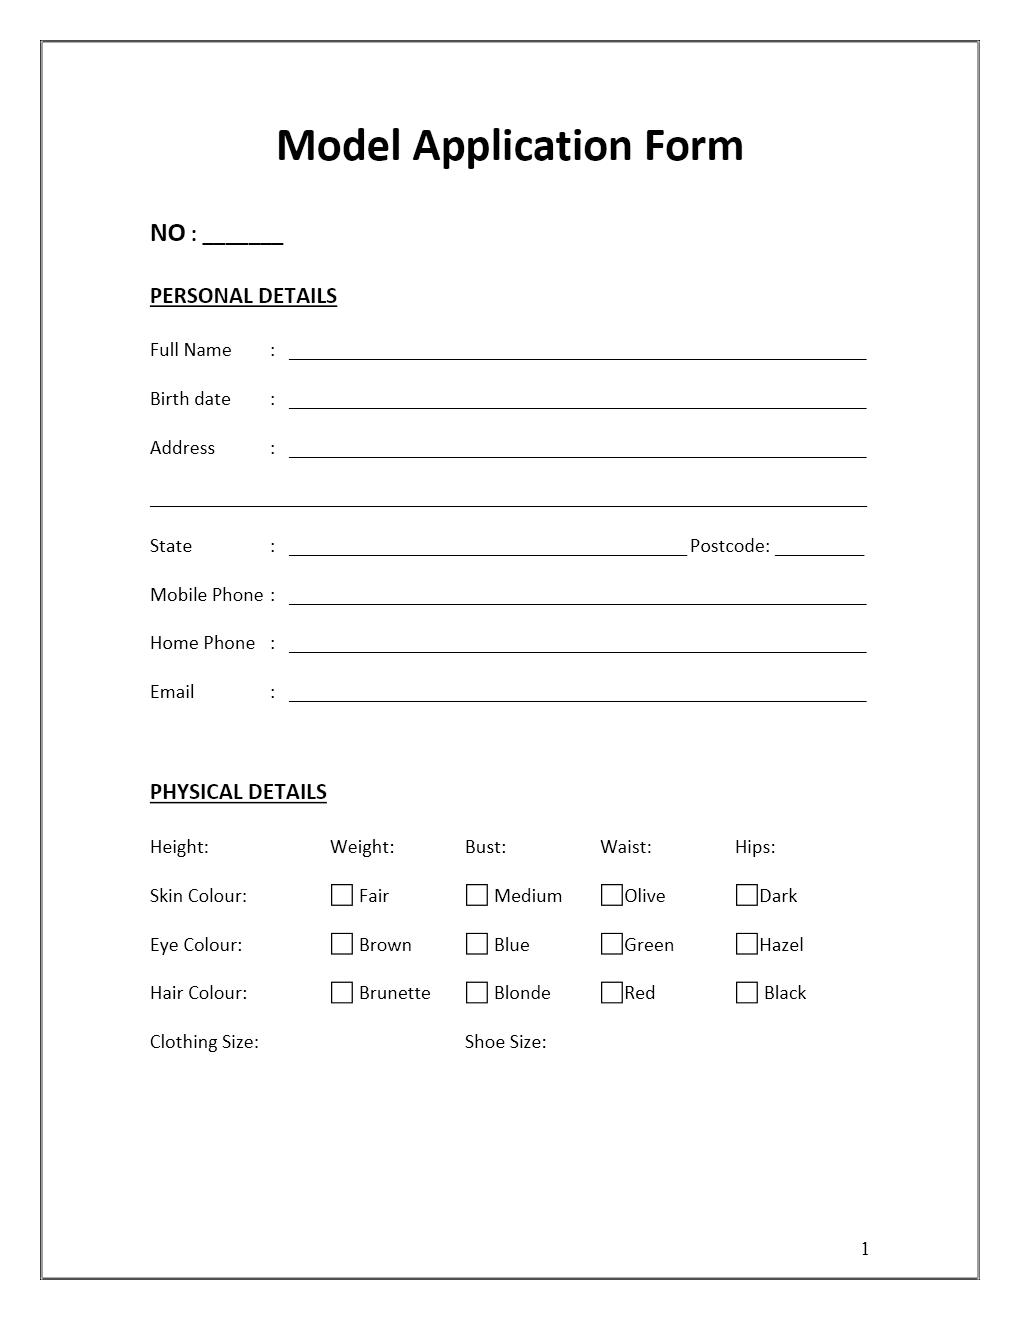 Sample Receipt Form template weekly calendar professional – Professional Receipt